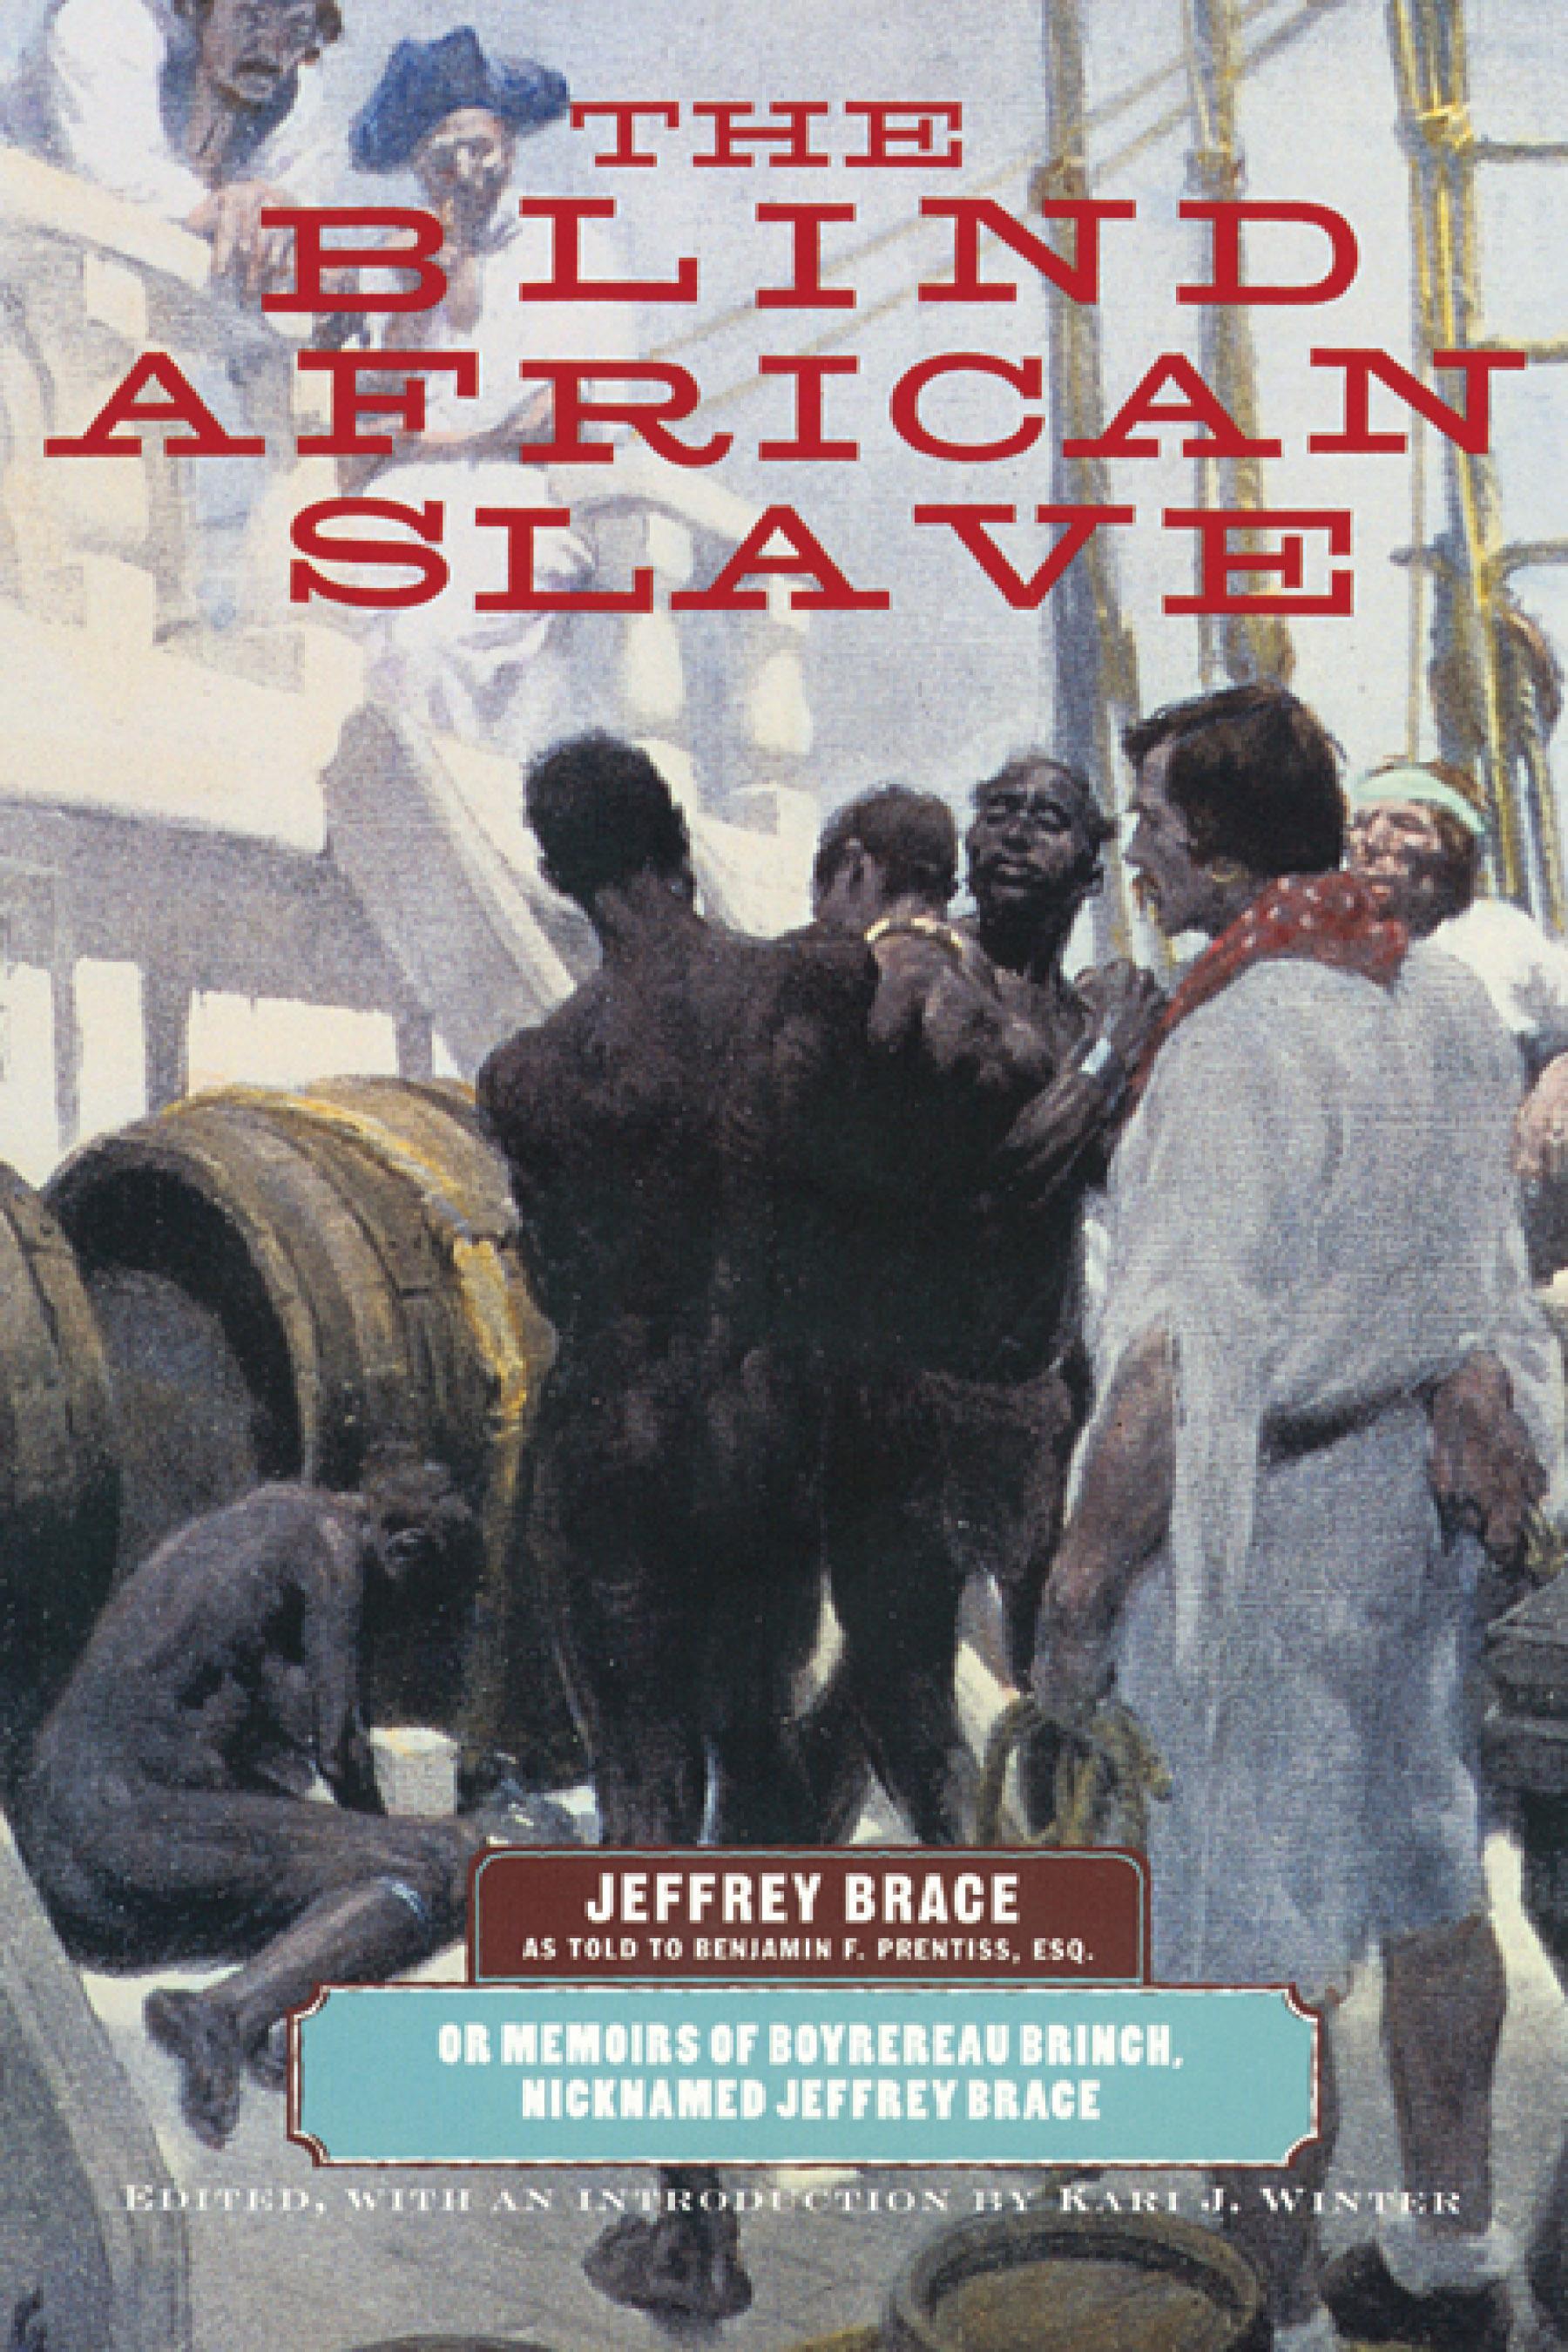 The Blind African Slave: Or Memoirs of Boyrereau Brinch, Nicknamed Jeffrey Brace EB9780299201432